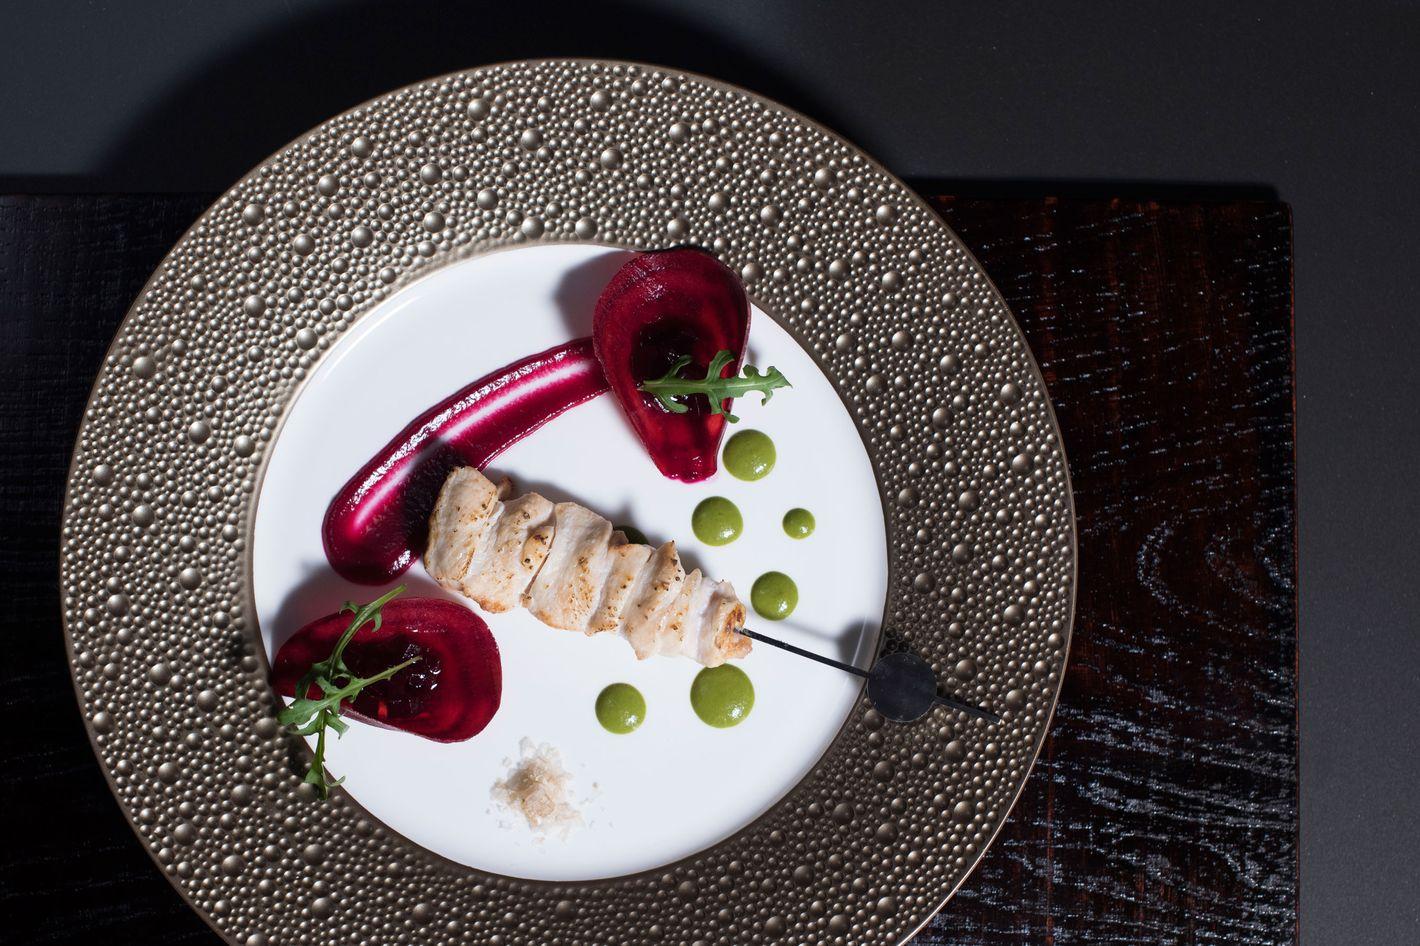 Tori-Mune Konsai: chicken breast, beets, arugula.